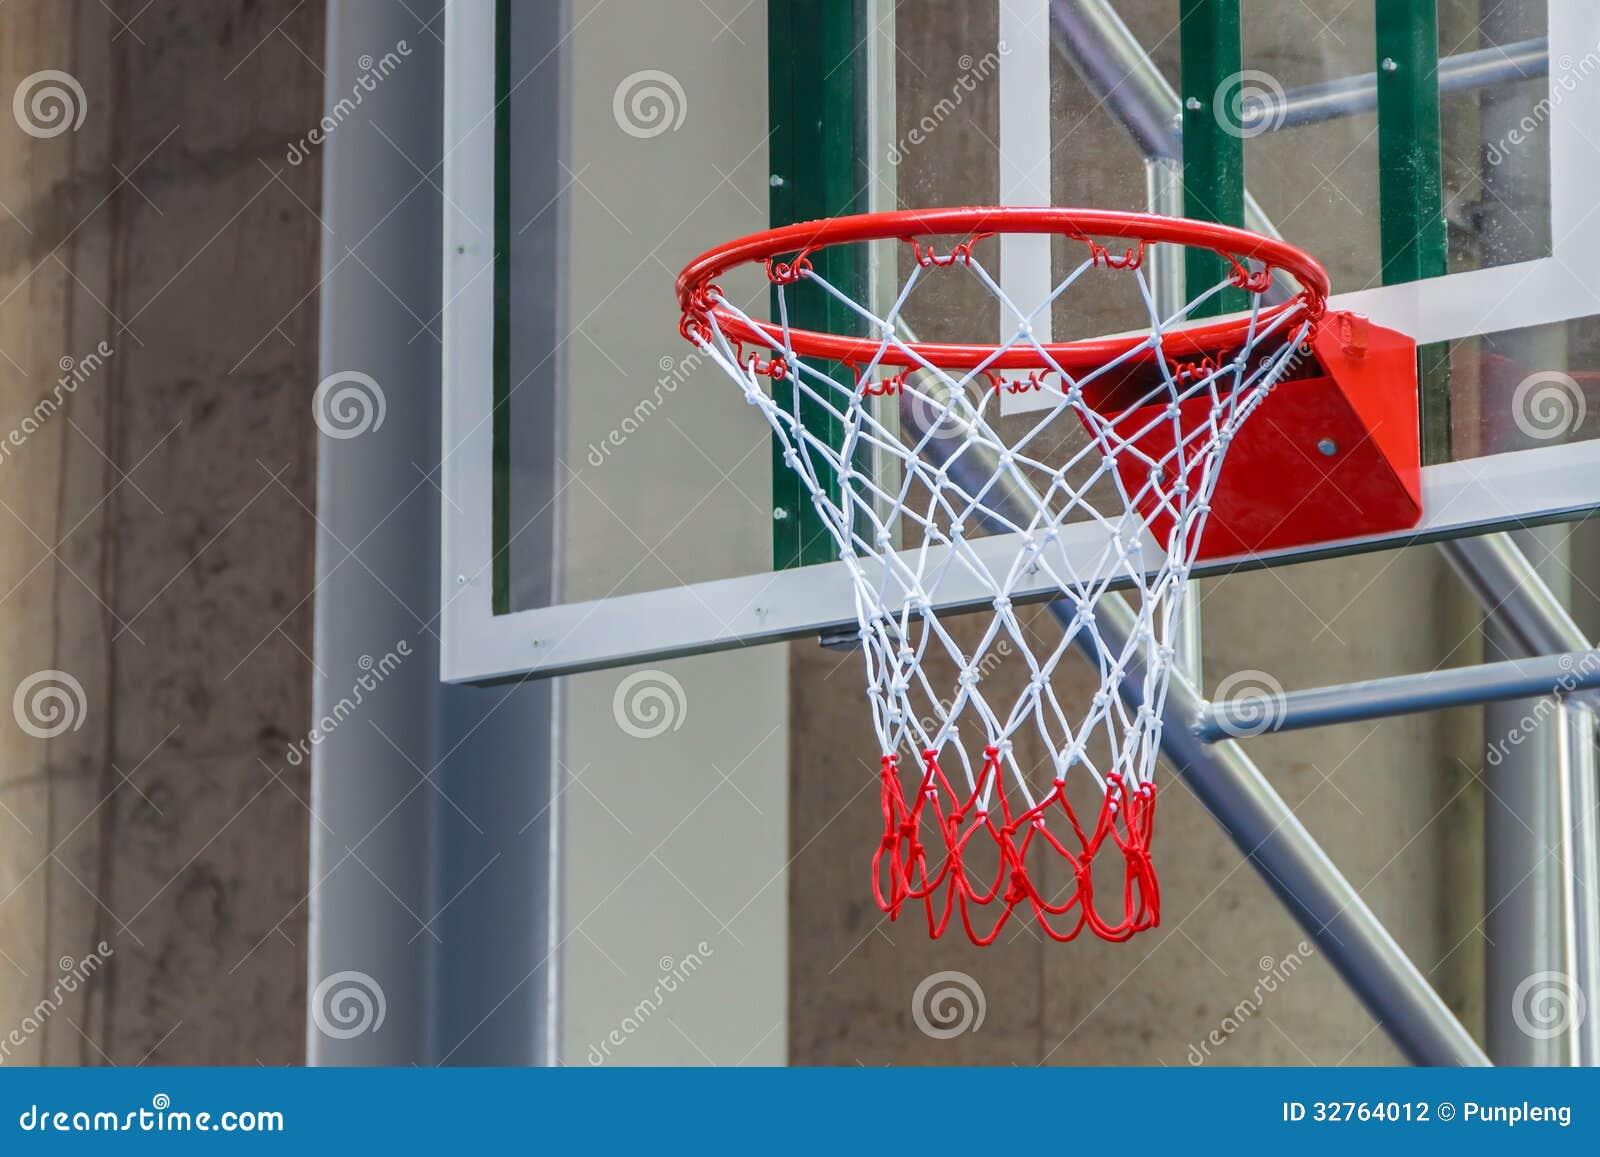 Closeup Of New Basketball Hoop Stock Photo - Image: 32764012